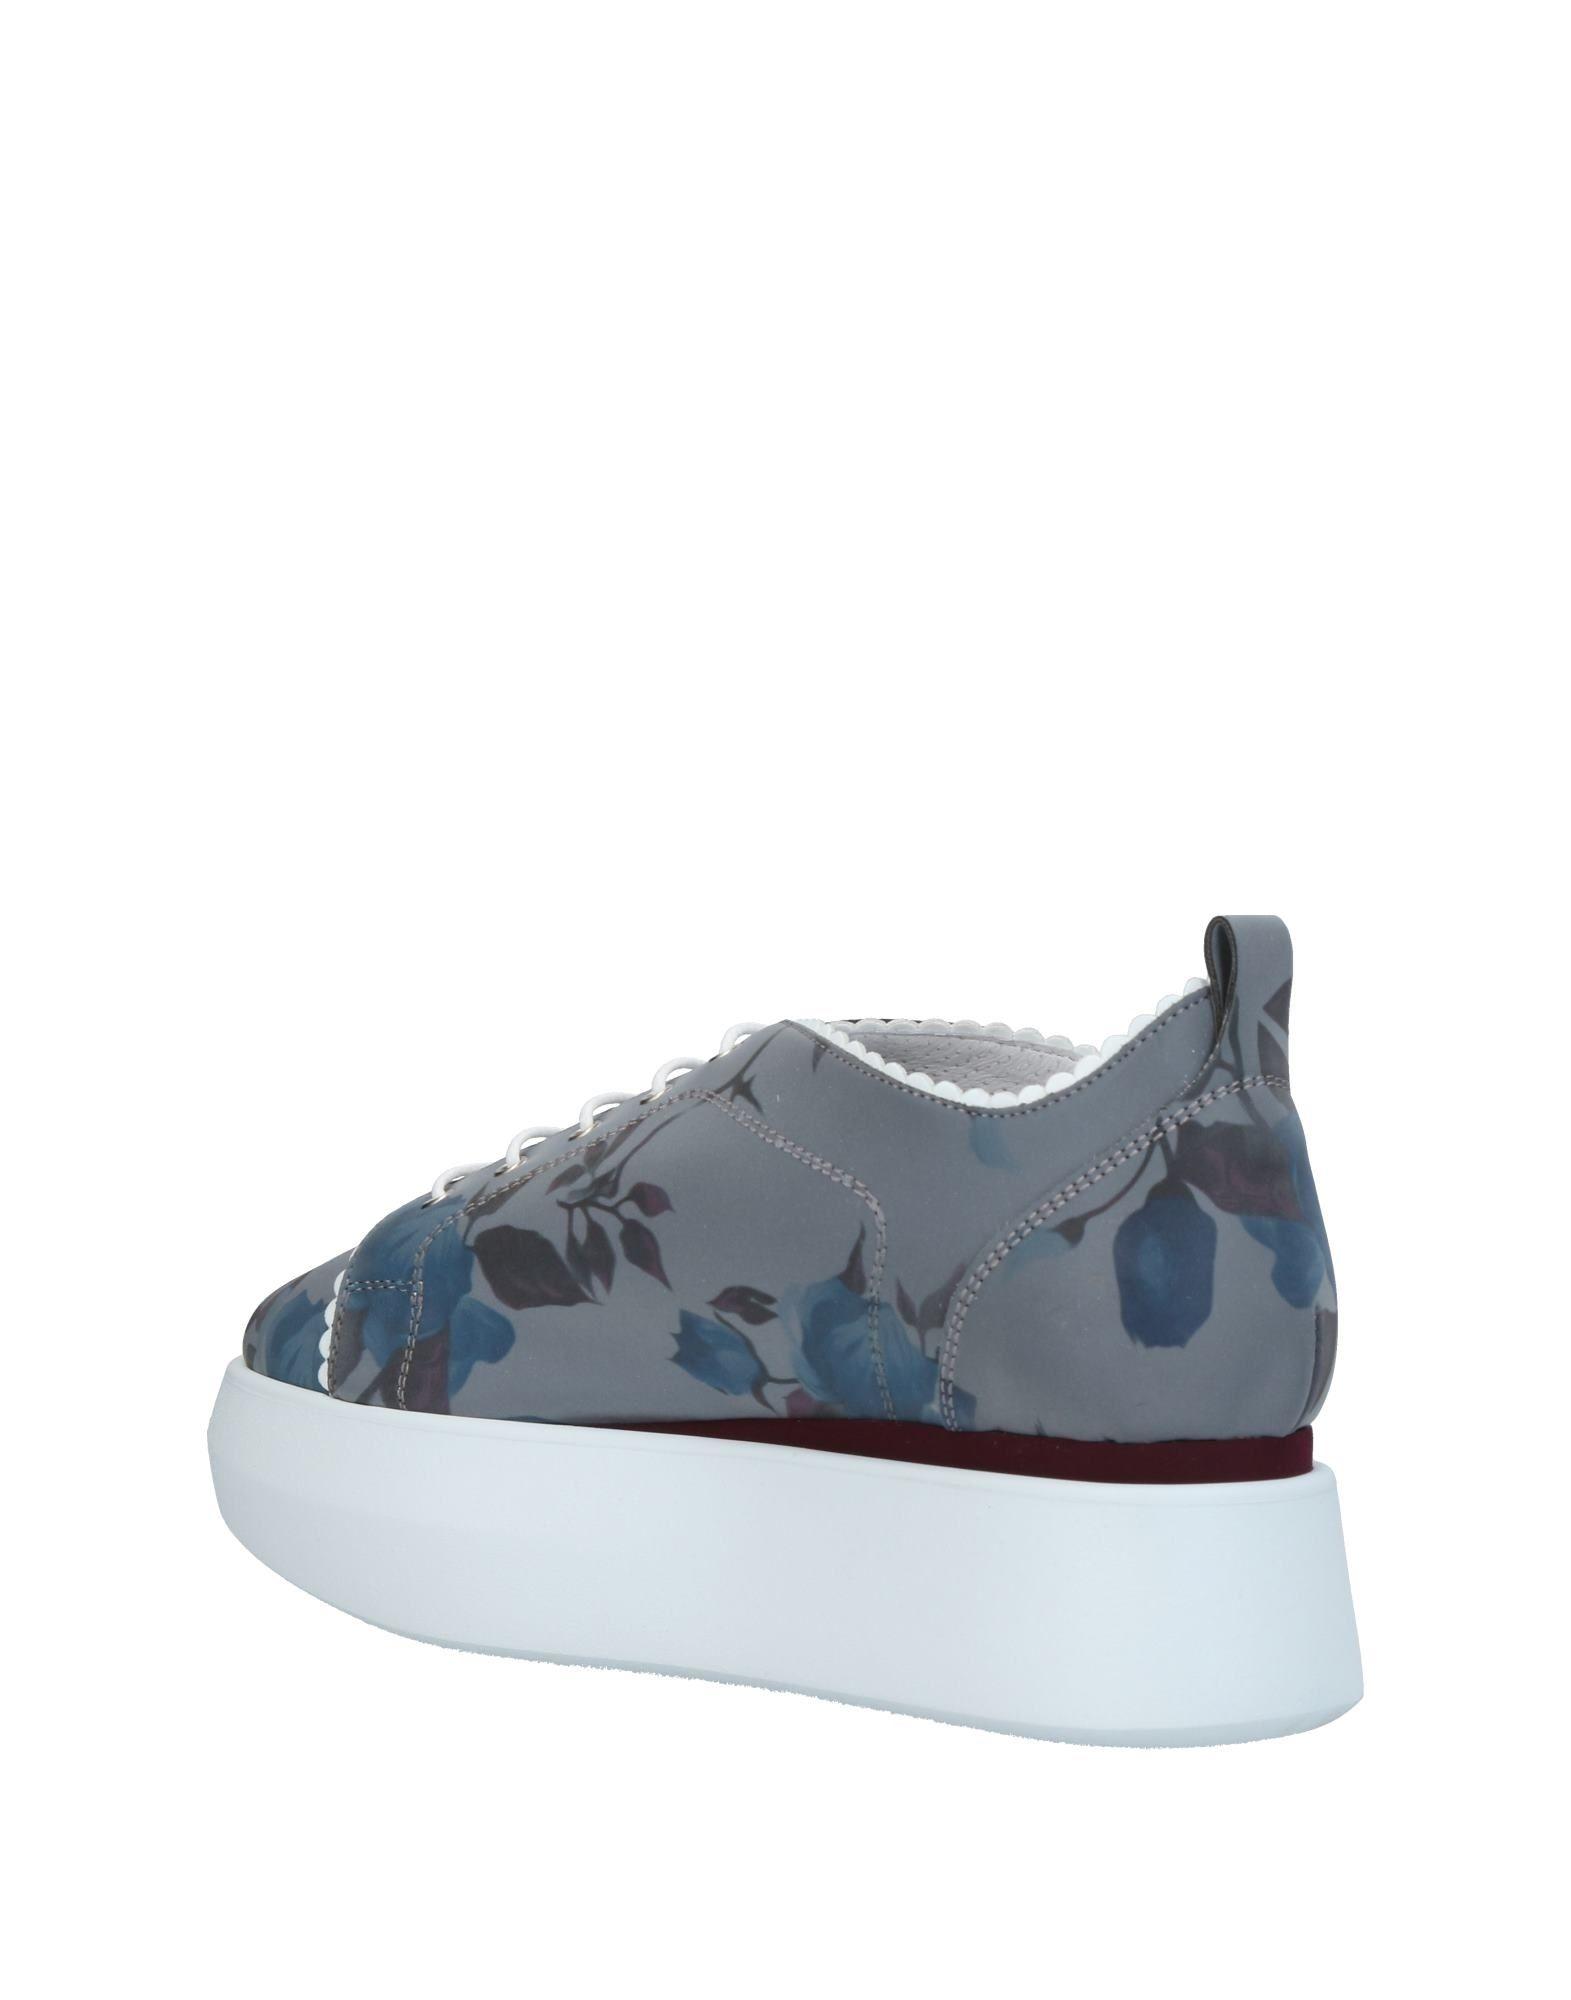 Alberto Guardiani Sneakers Damen  11428456CA Gute Qualität beliebte Schuhe